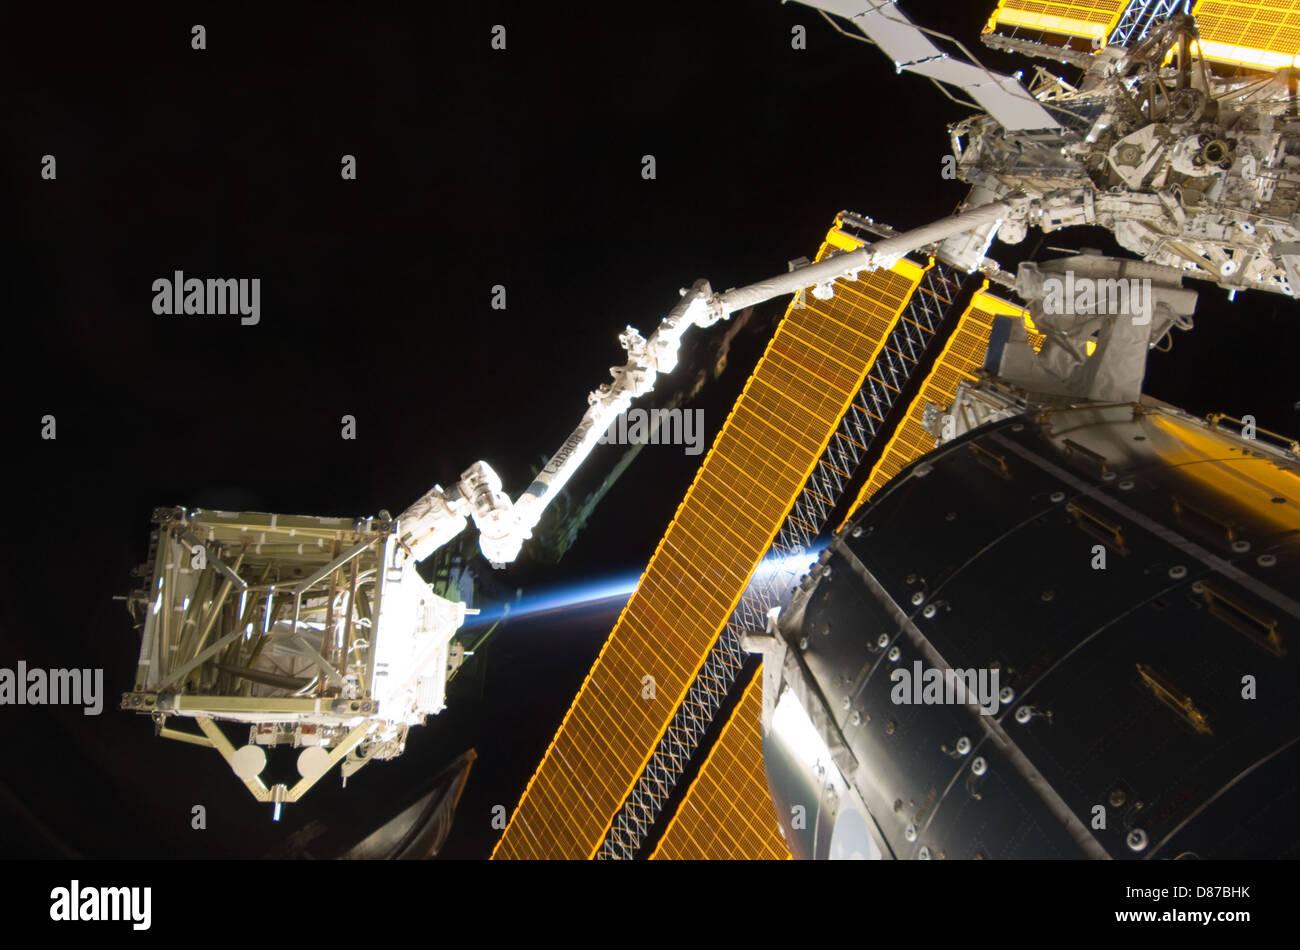 STS-119 S6 Handover.jpg - Stock Image